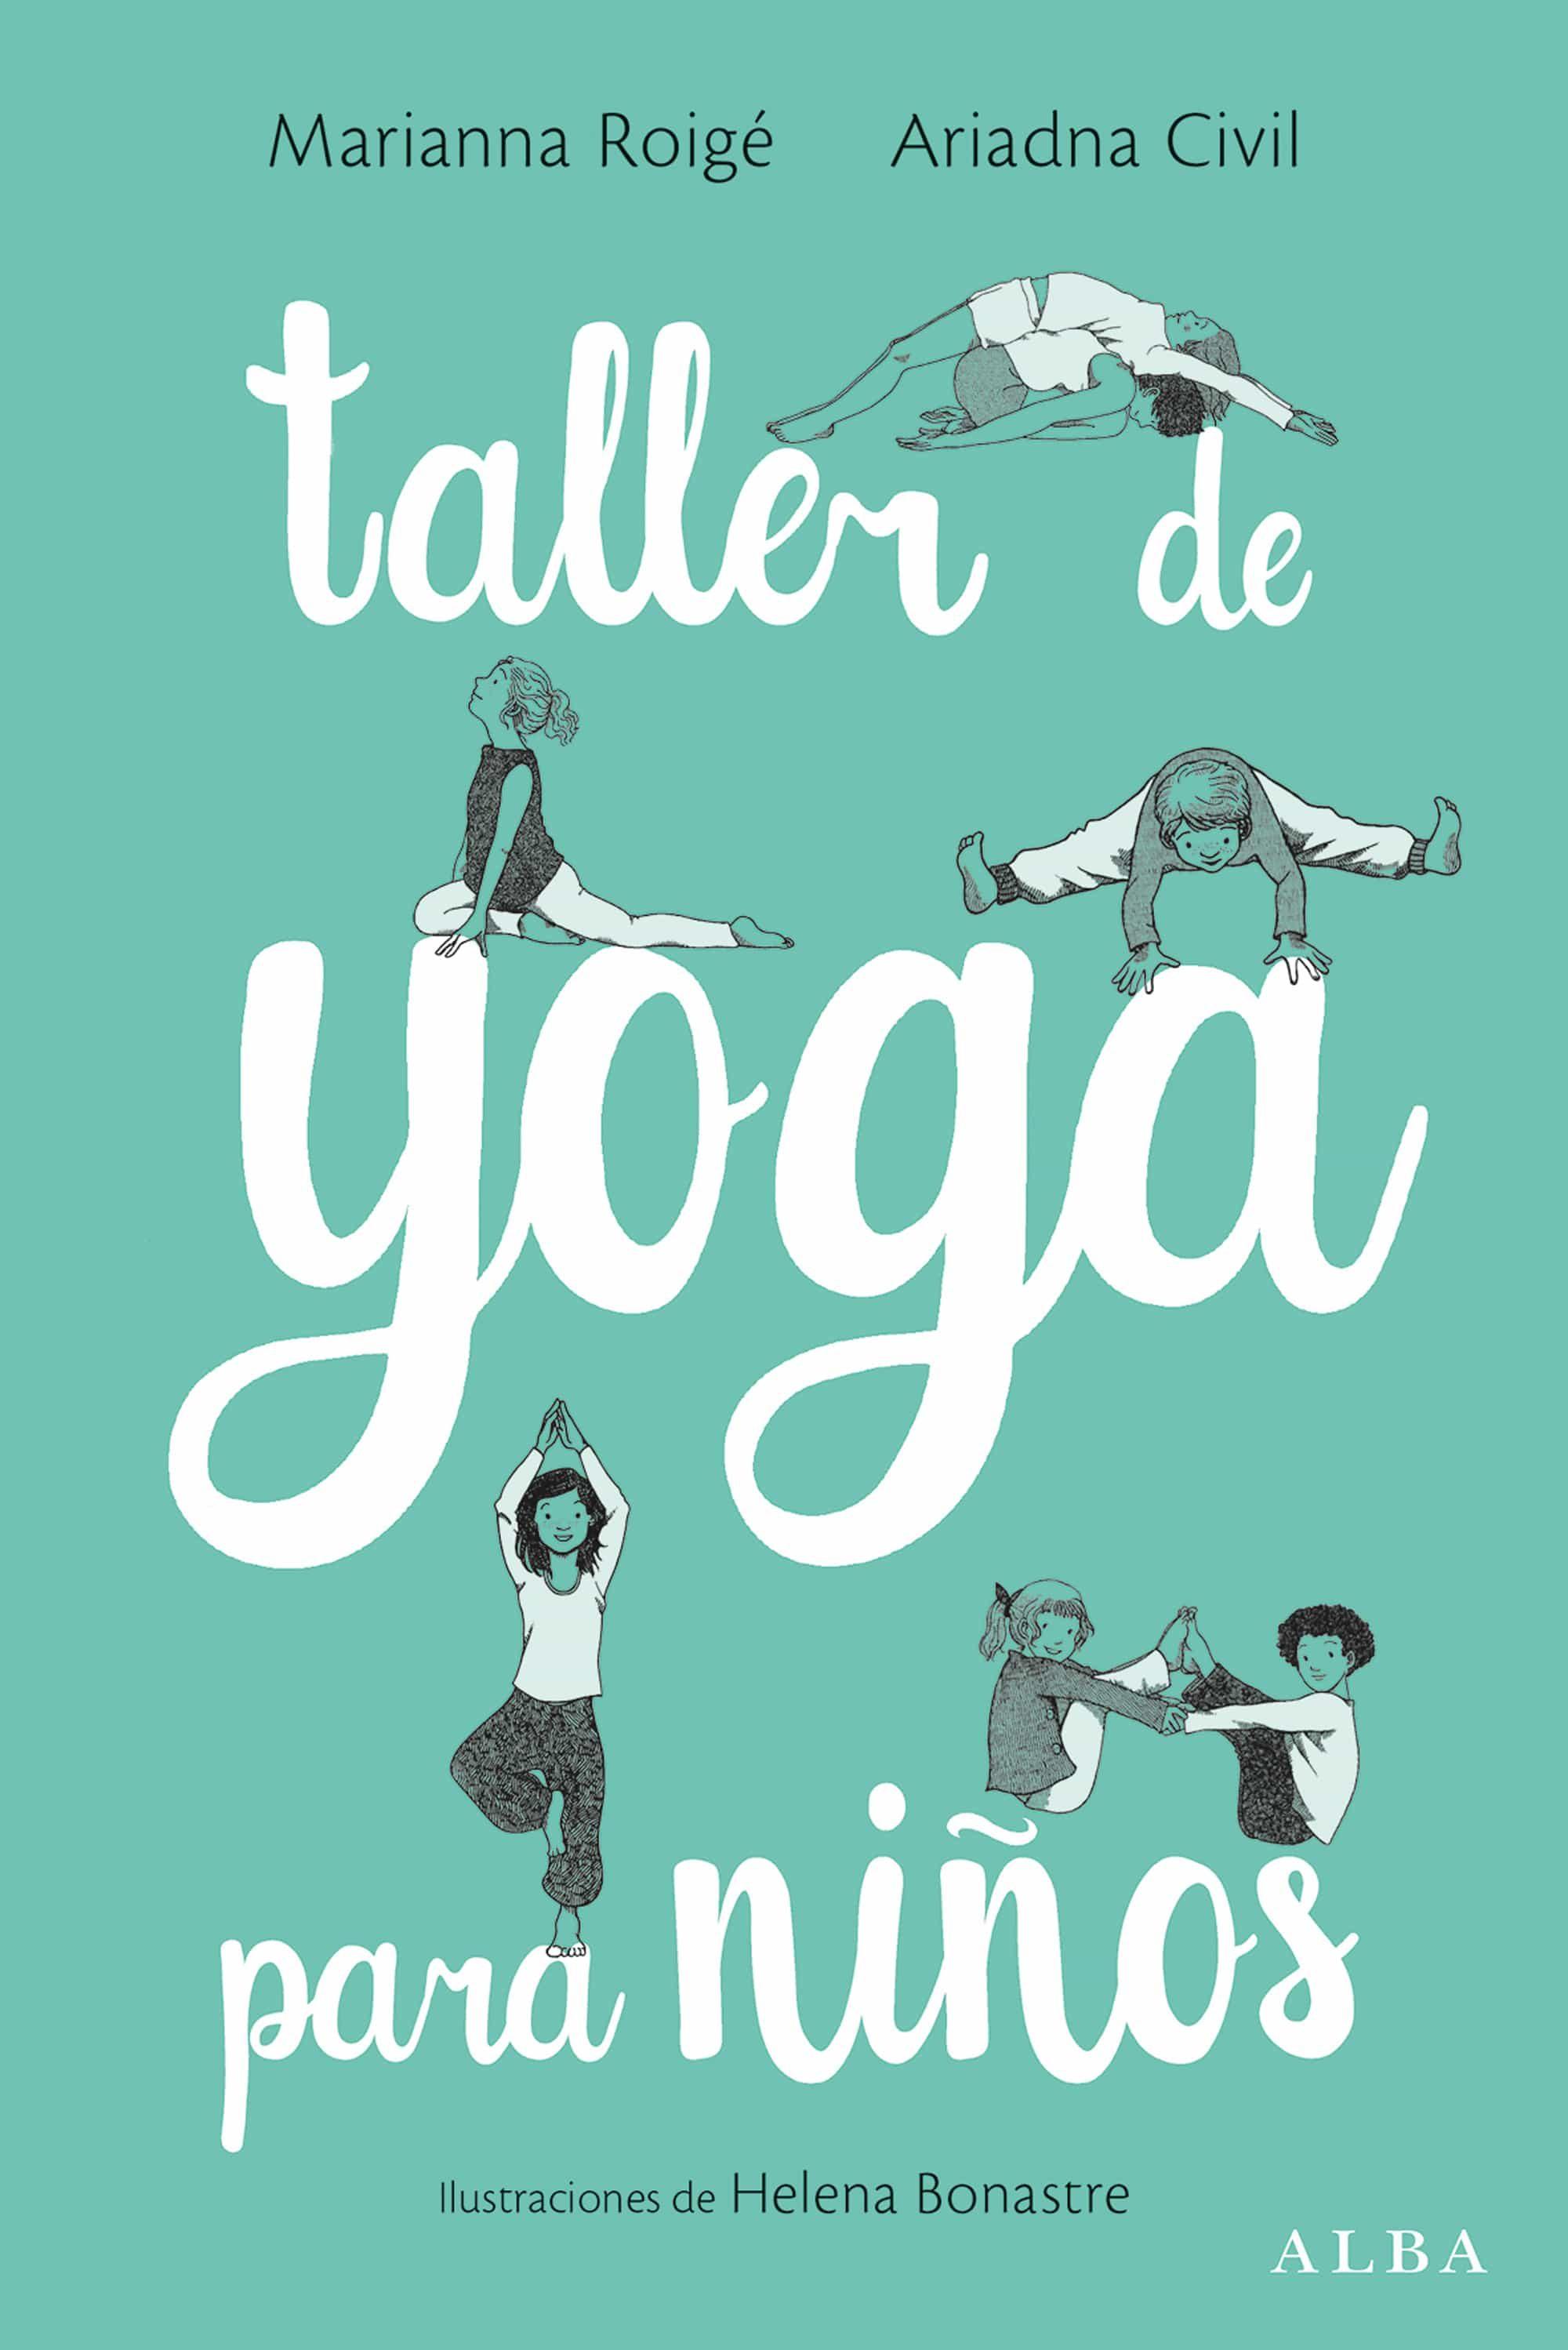 taller de yoga para niños (ebook)-marianna roige-9788490654163 a5f4e46235f1